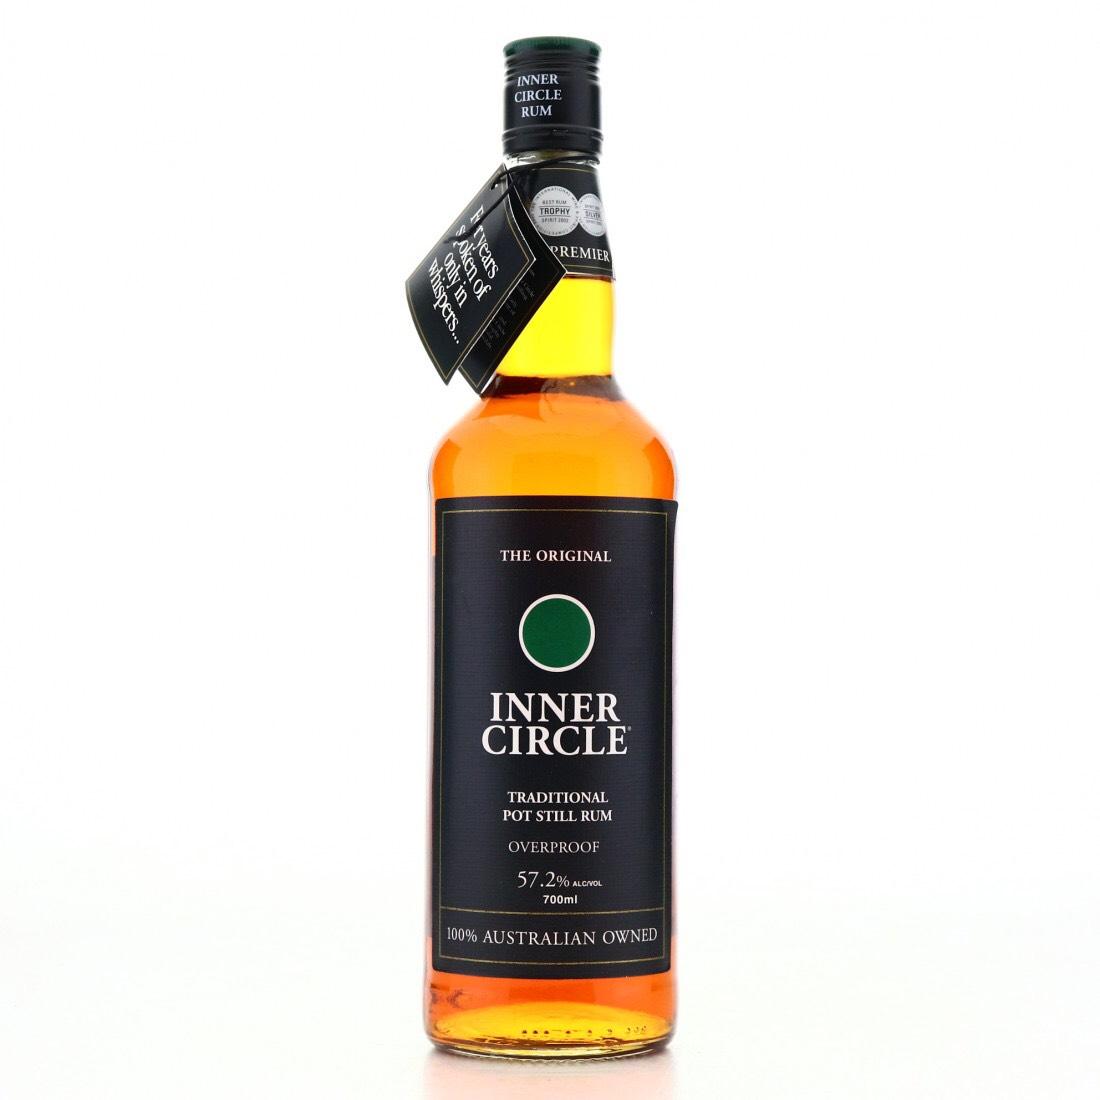 Bottle image of Overproof Traditional Pot Still Rum